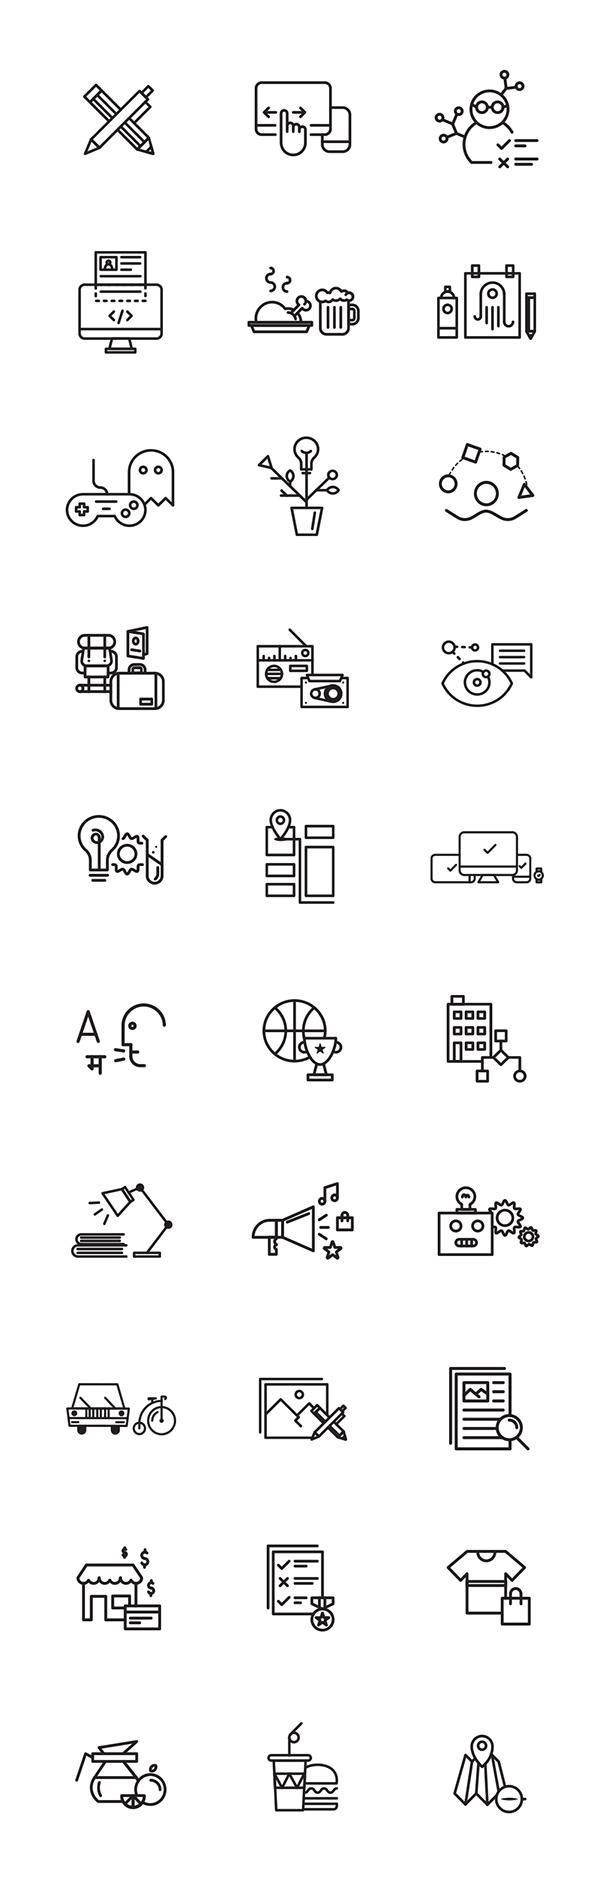 30 Free Icons On Behance Icon Design Inspiration Icon Design Free Icons [ 1900 x 600 Pixel ]